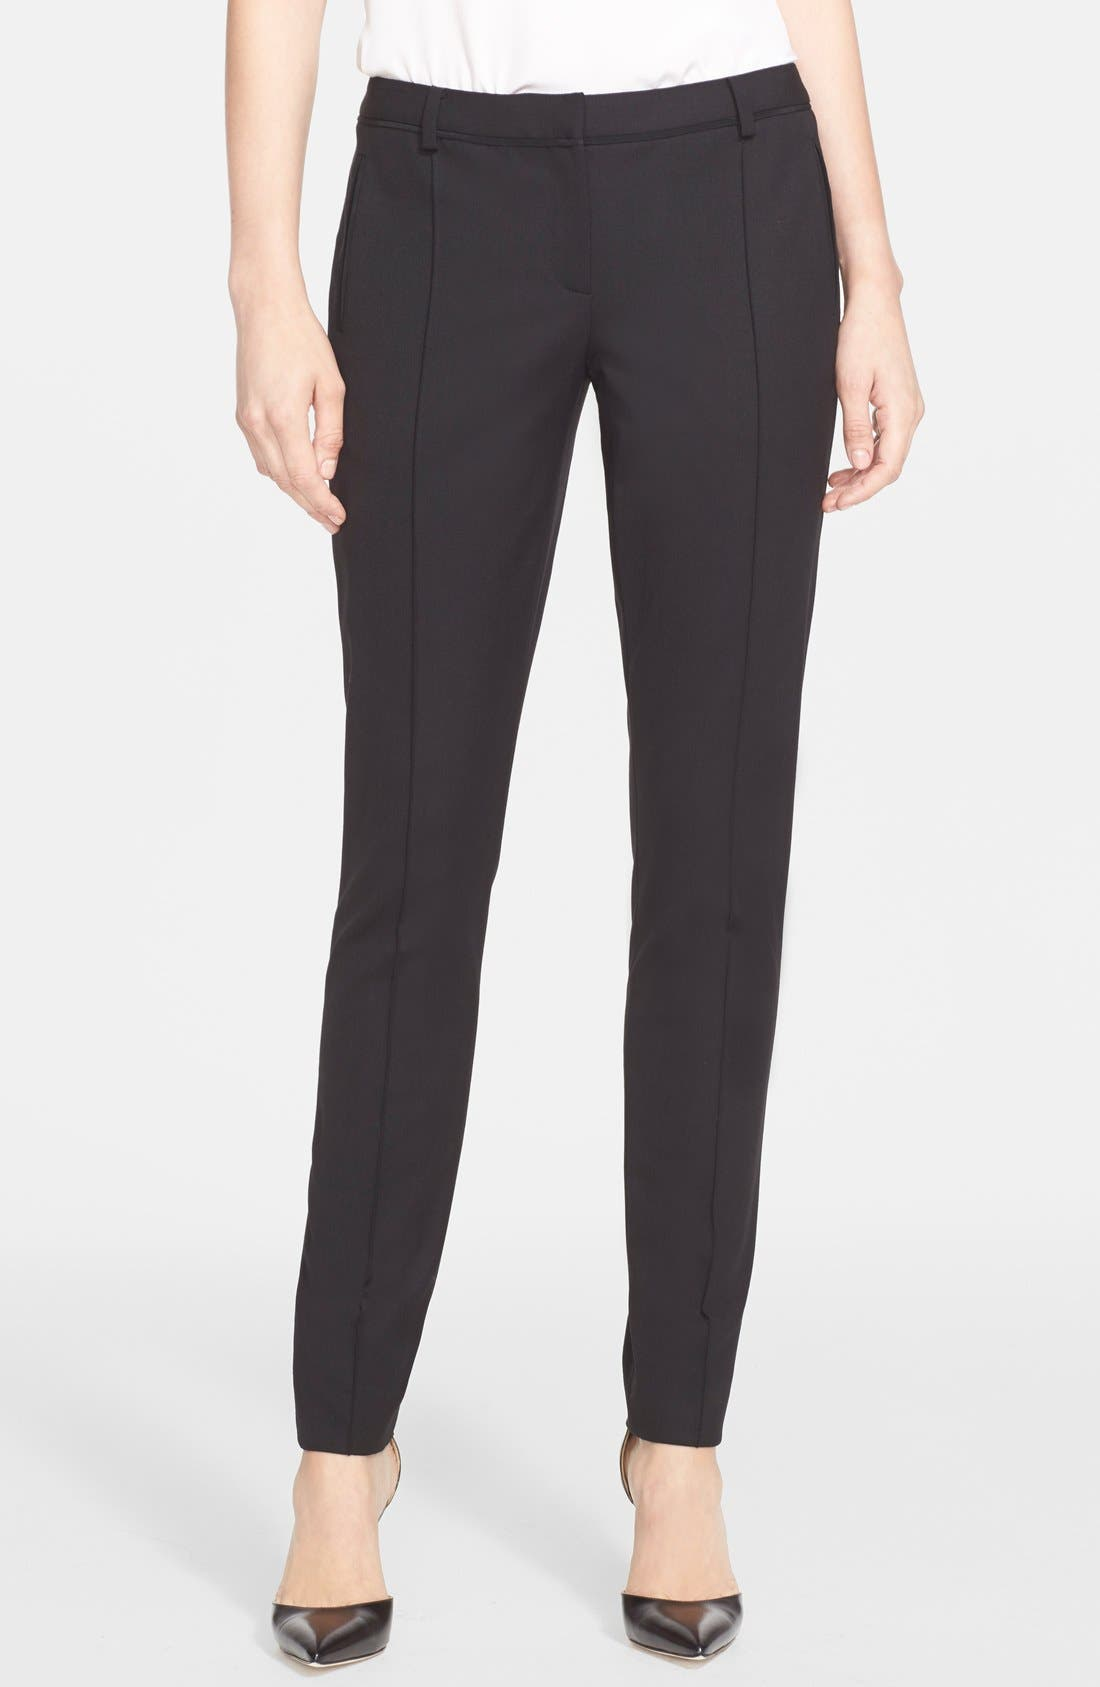 Jason Wu Collection Women's Jason Wu Stretch Gabardine Crop Pants